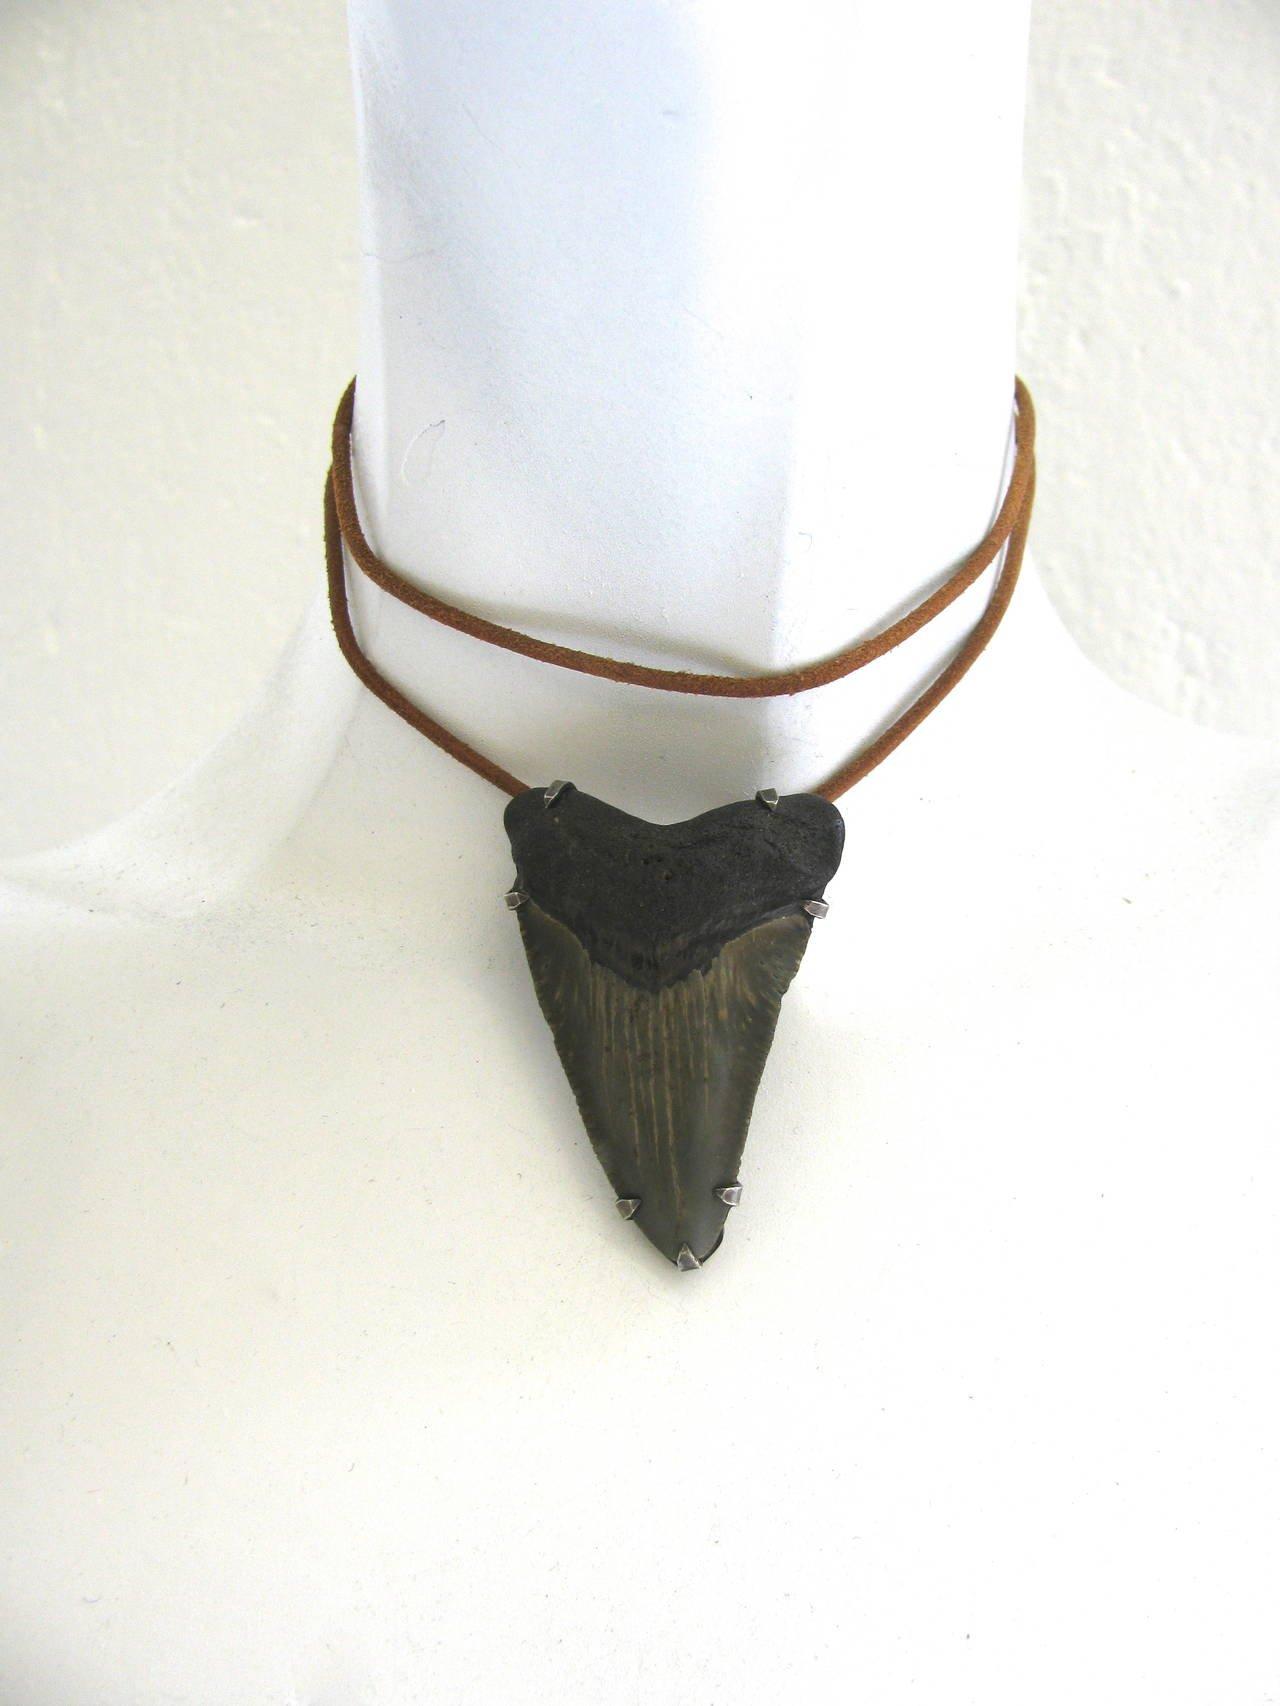 Pirate Queen Megalodon Pendant